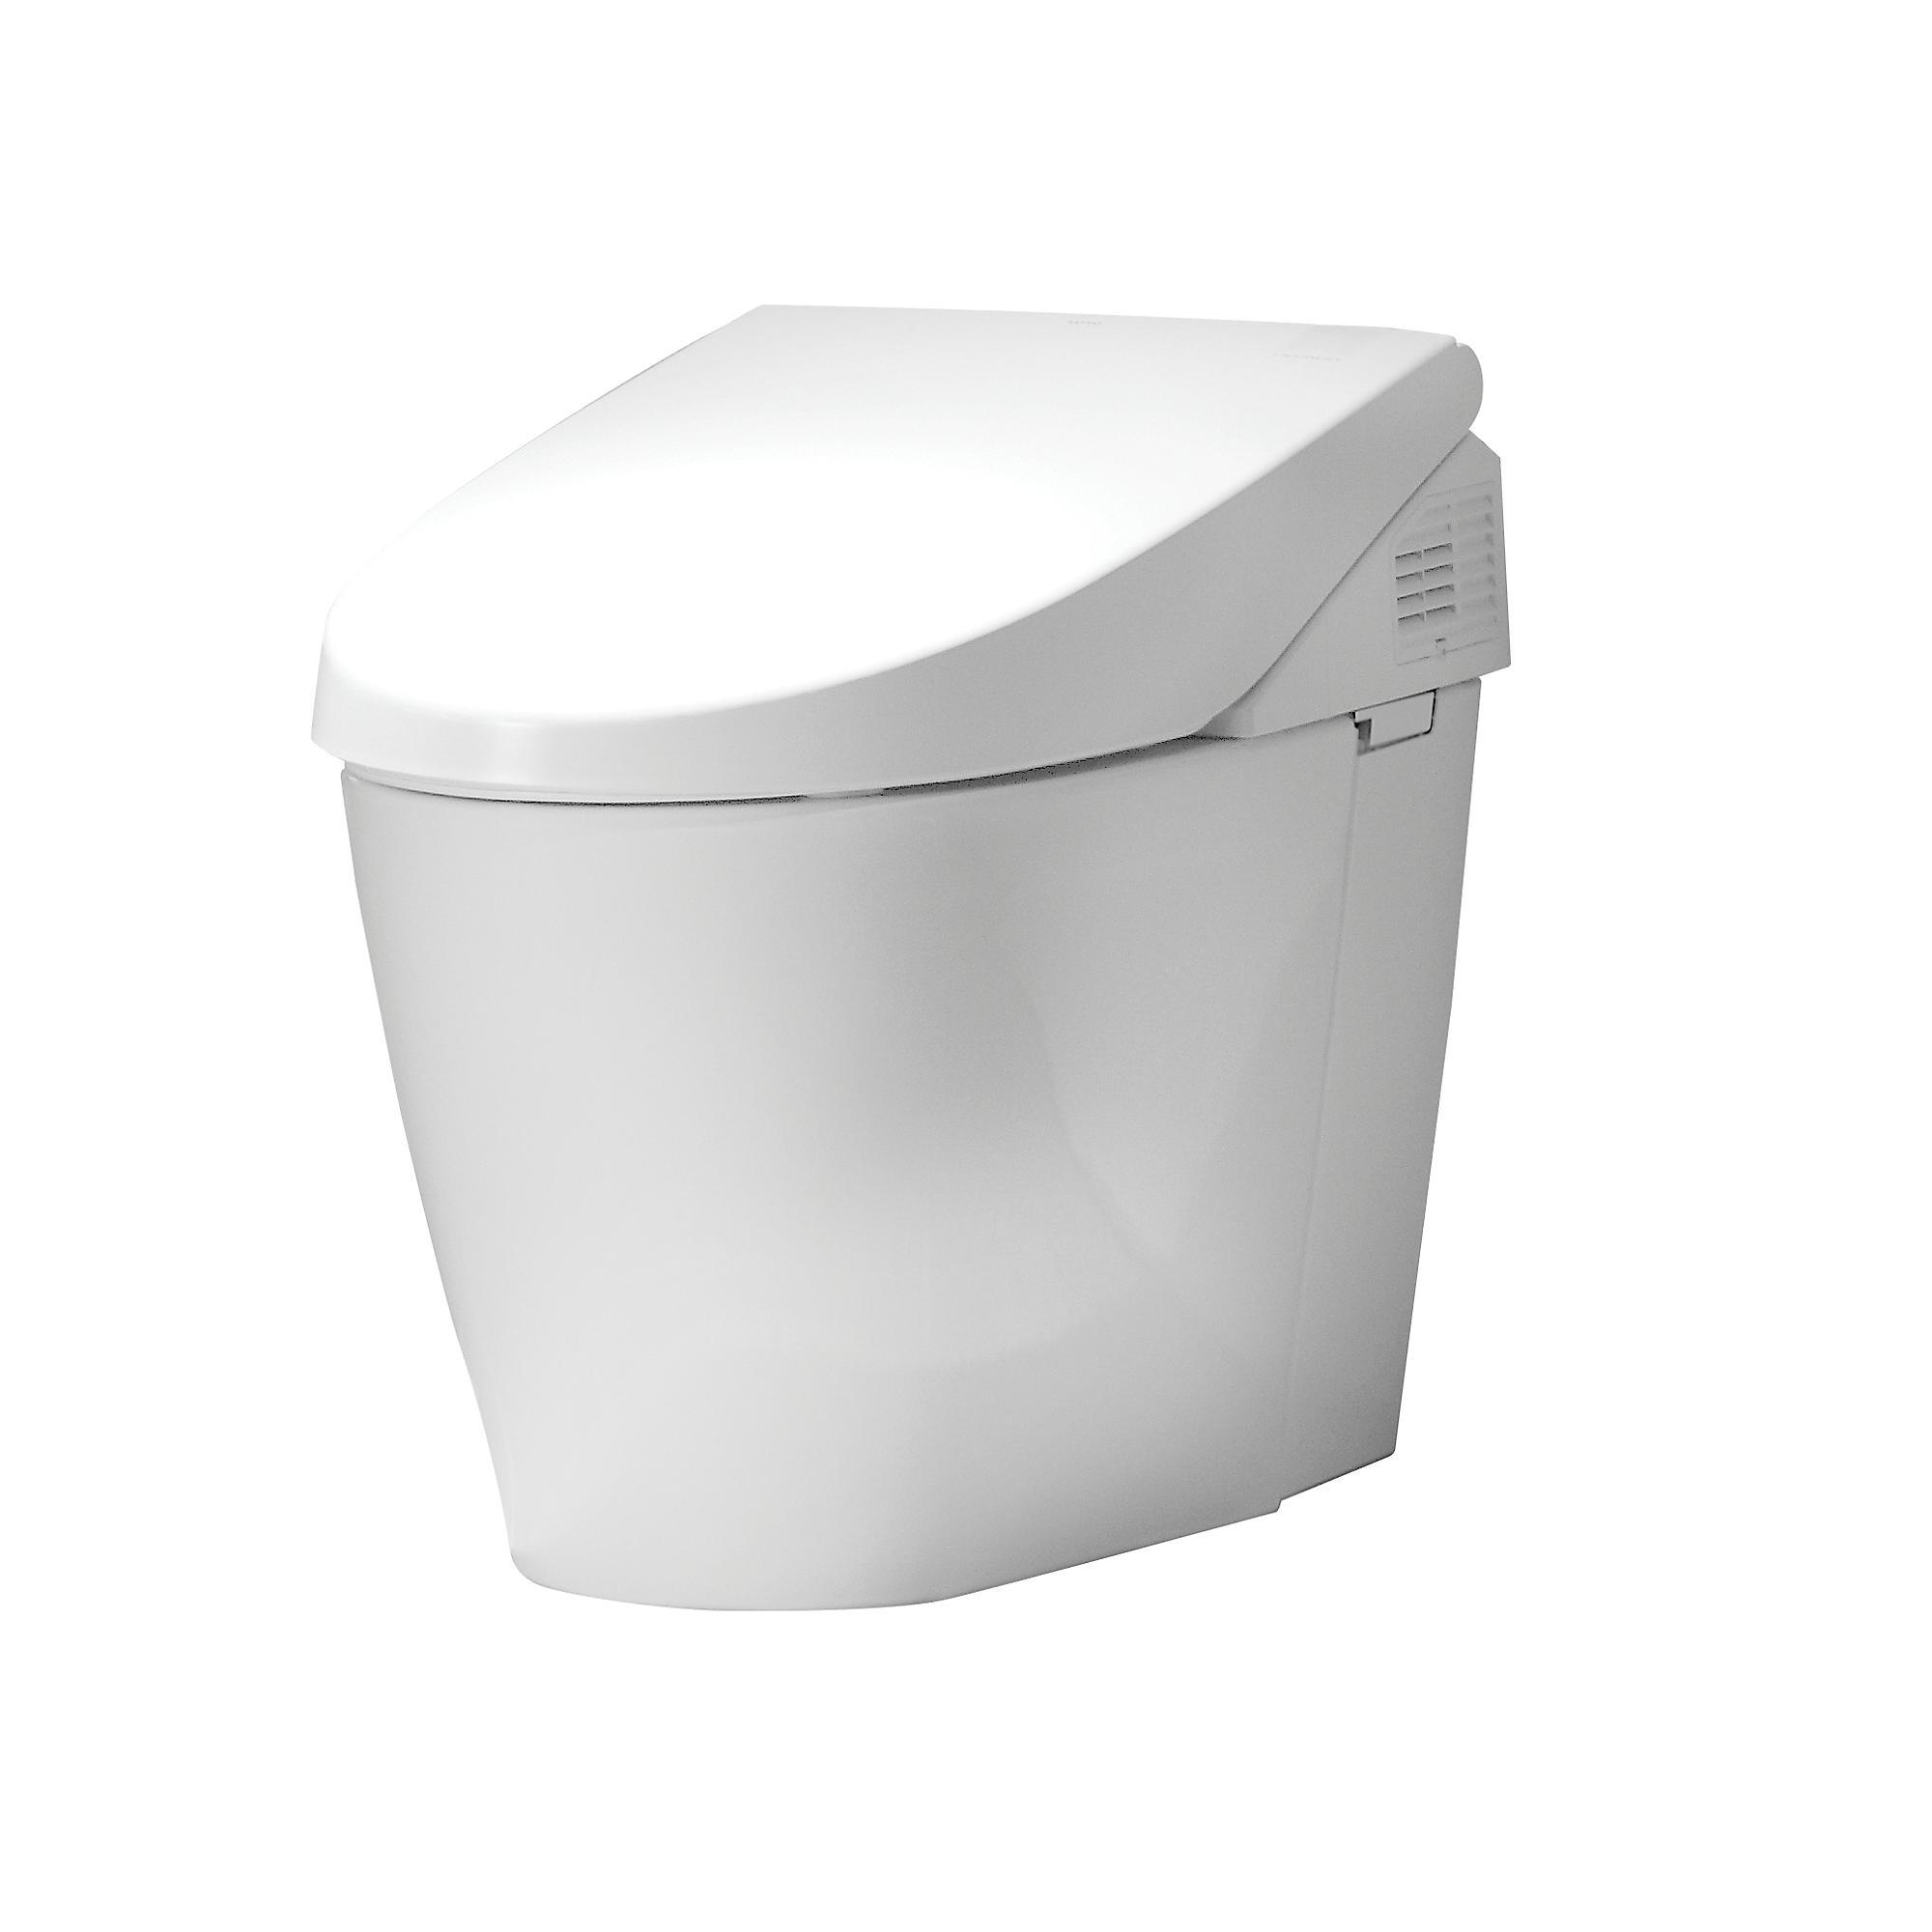 Ms982cumg 01 neorest  550h dual flush toilet  1 0   0 8 gpf 0